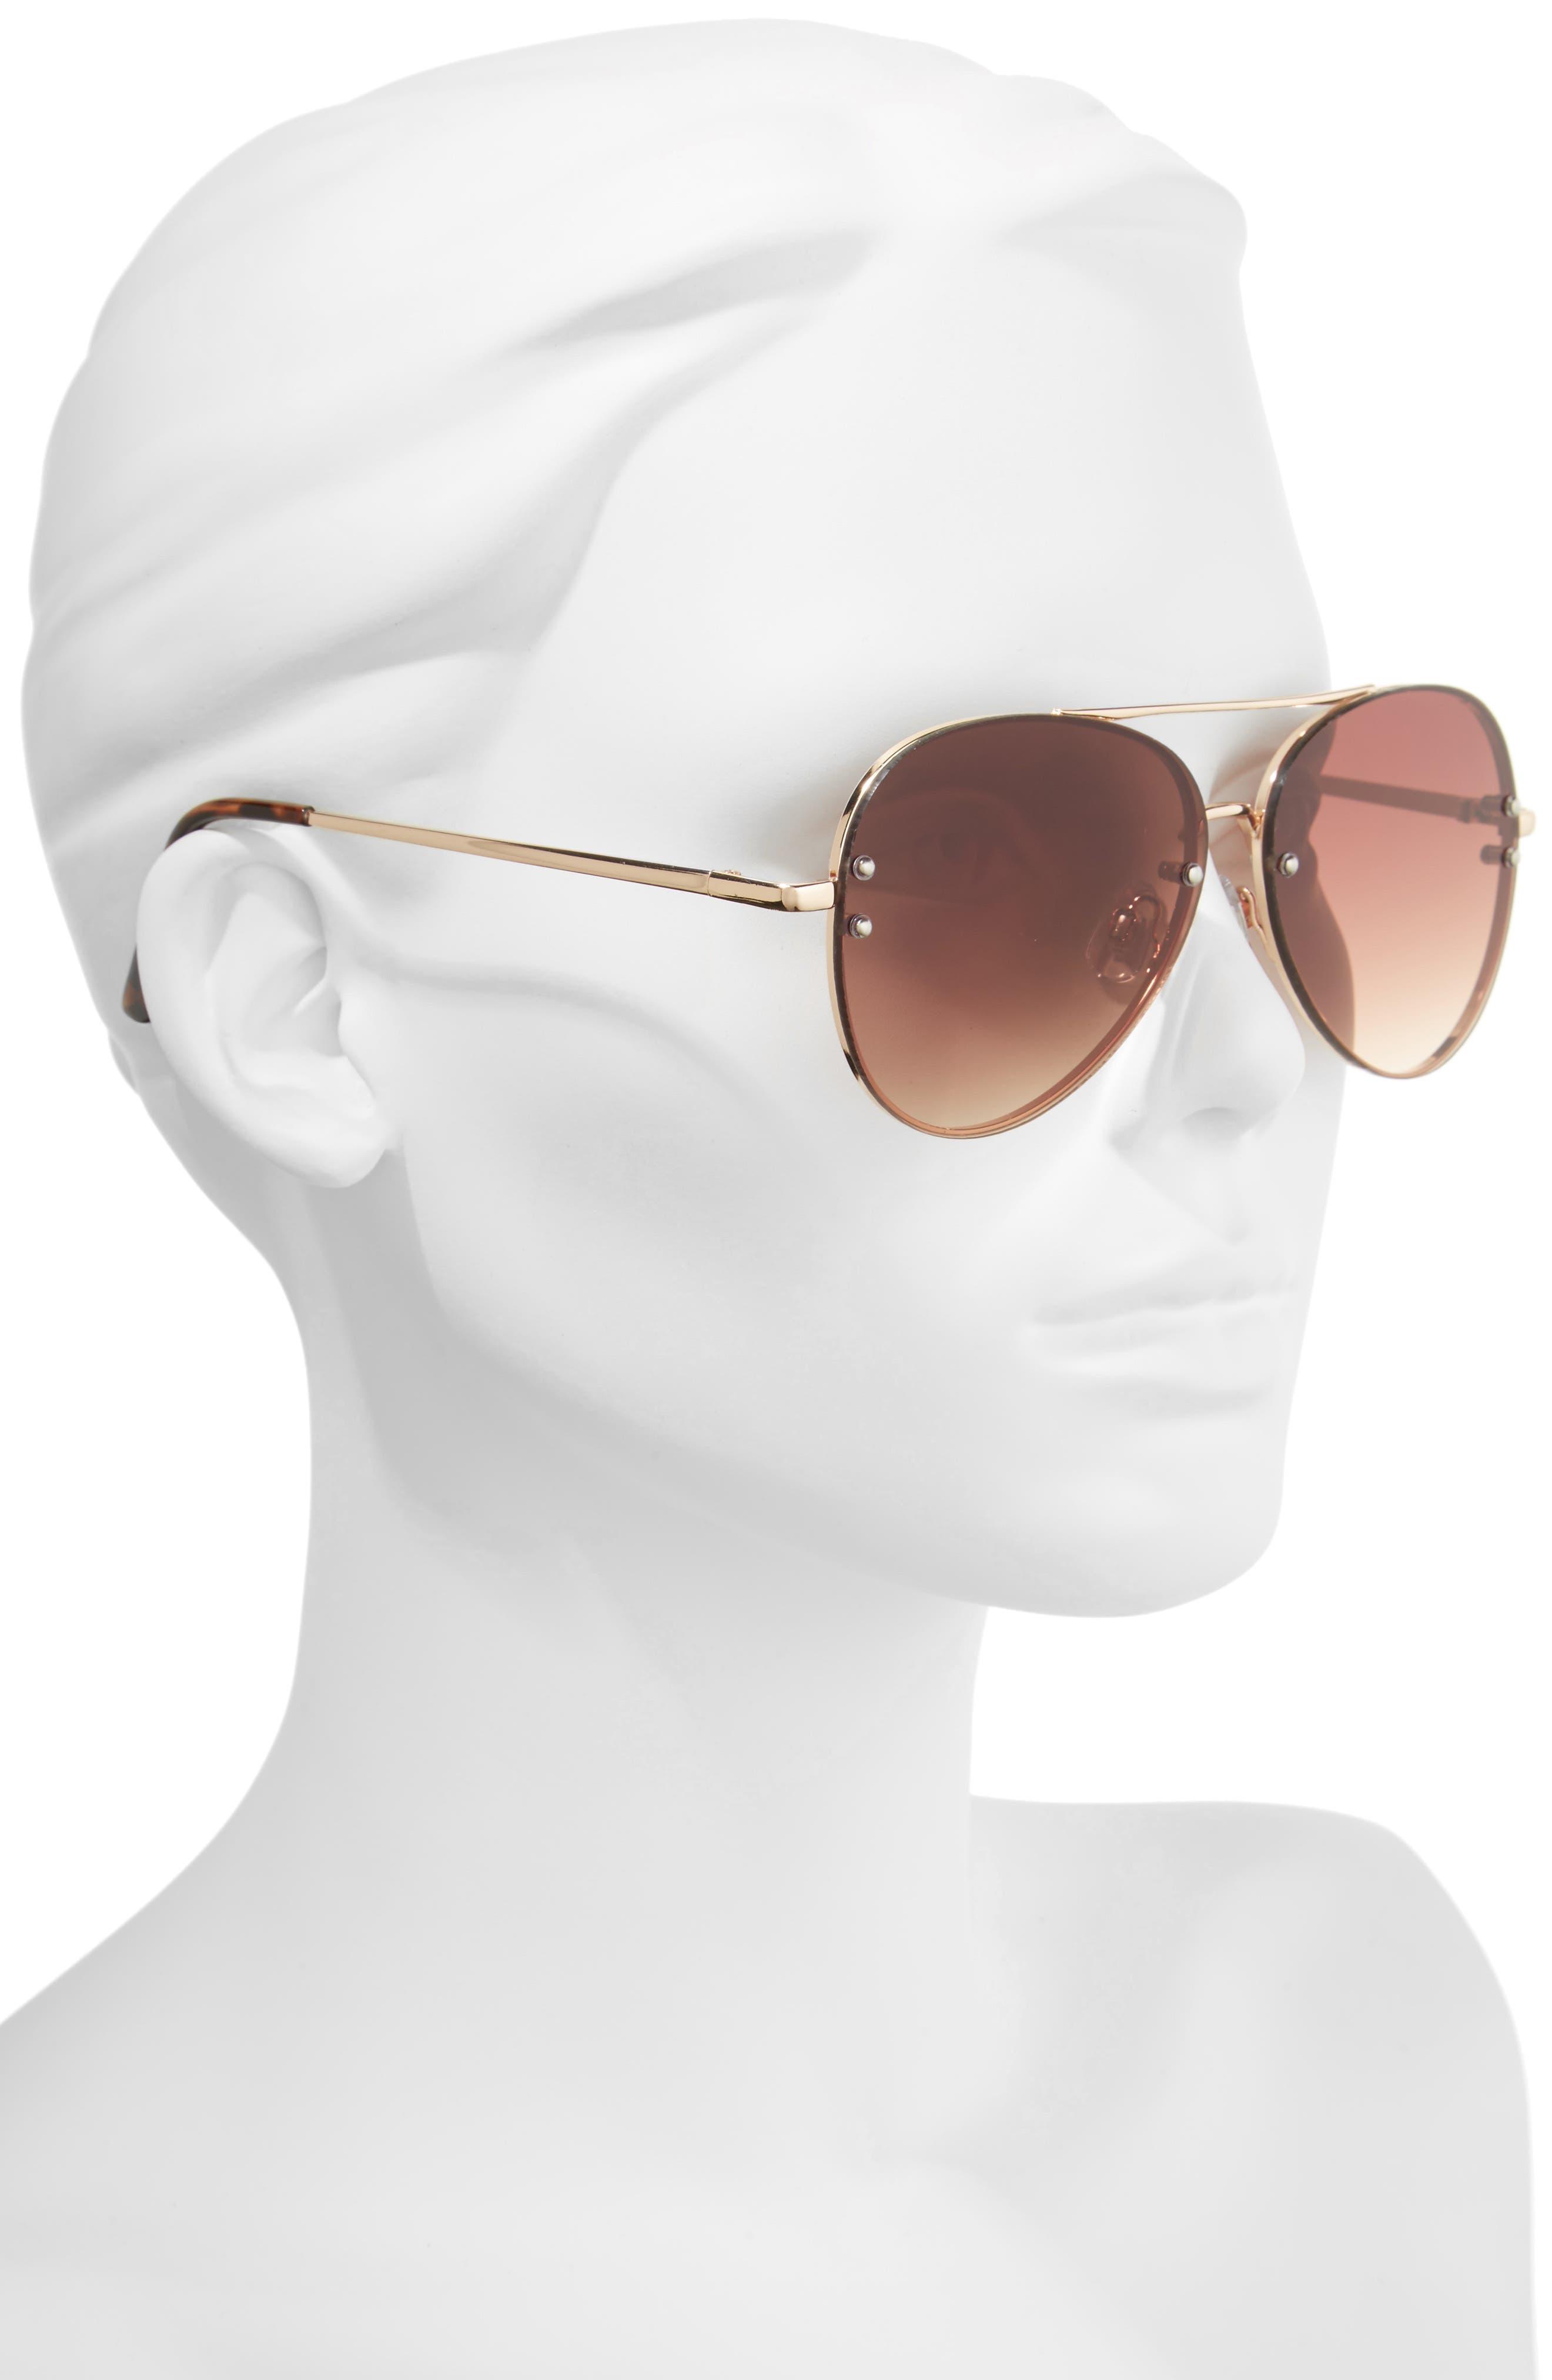 BP., 60mm Oversize Mirrored Aviator Sunglasses, Alternate thumbnail 2, color, GOLD/ BROWN